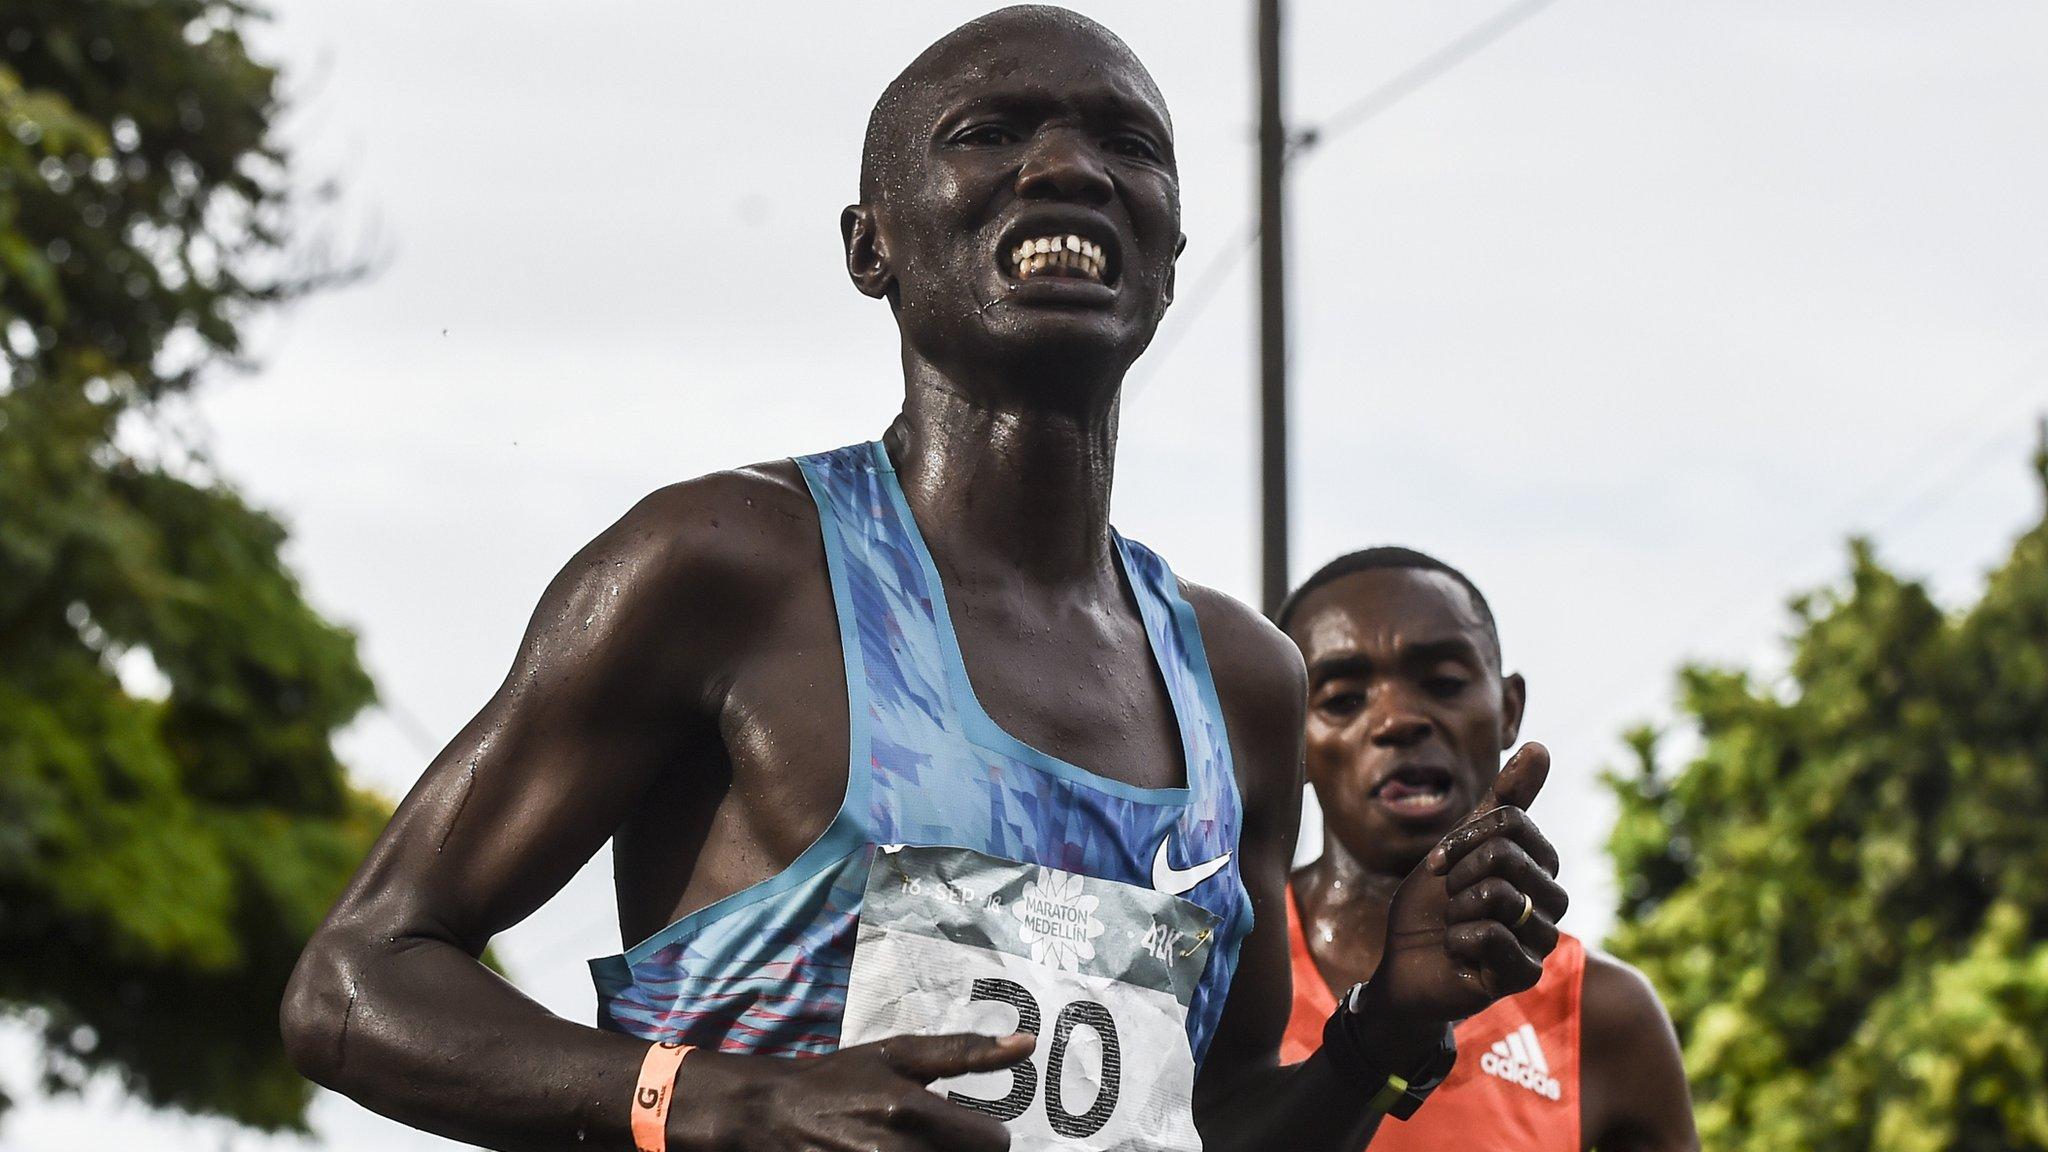 Joseph Kiprono Kiptum: Kenyan athlete hit by car during Medellin half marathon